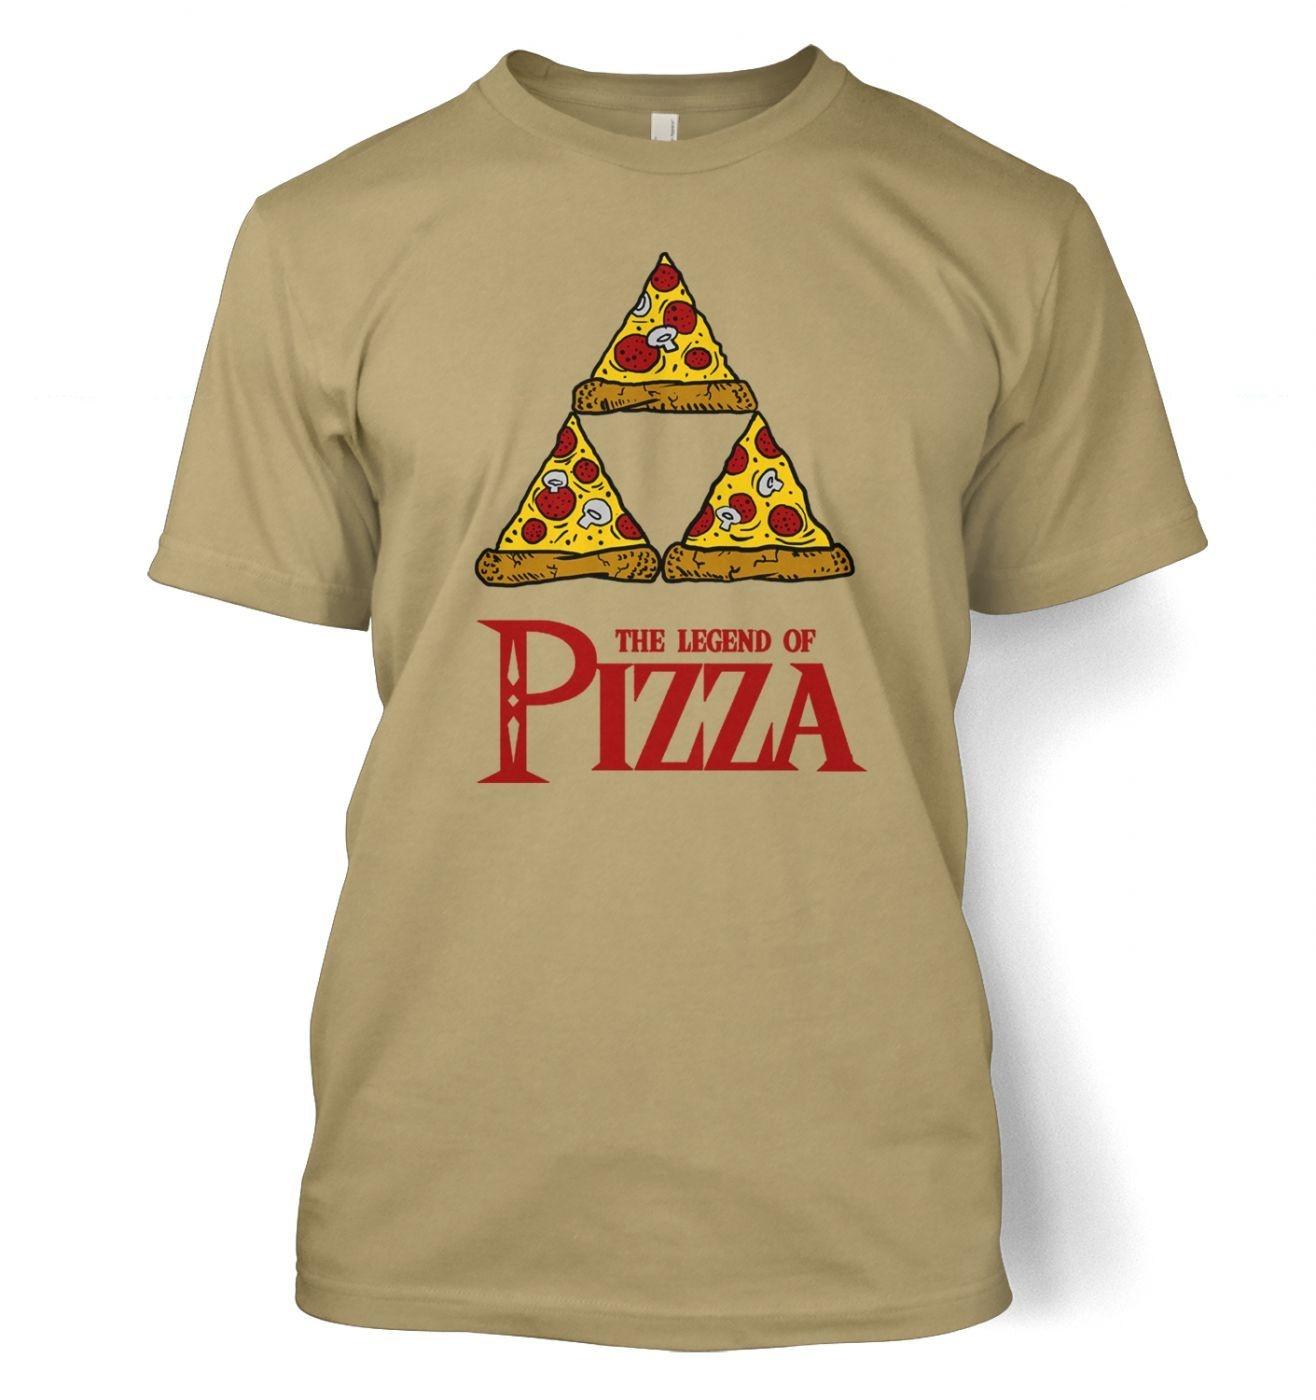 Legend Of Pizza t-shirt